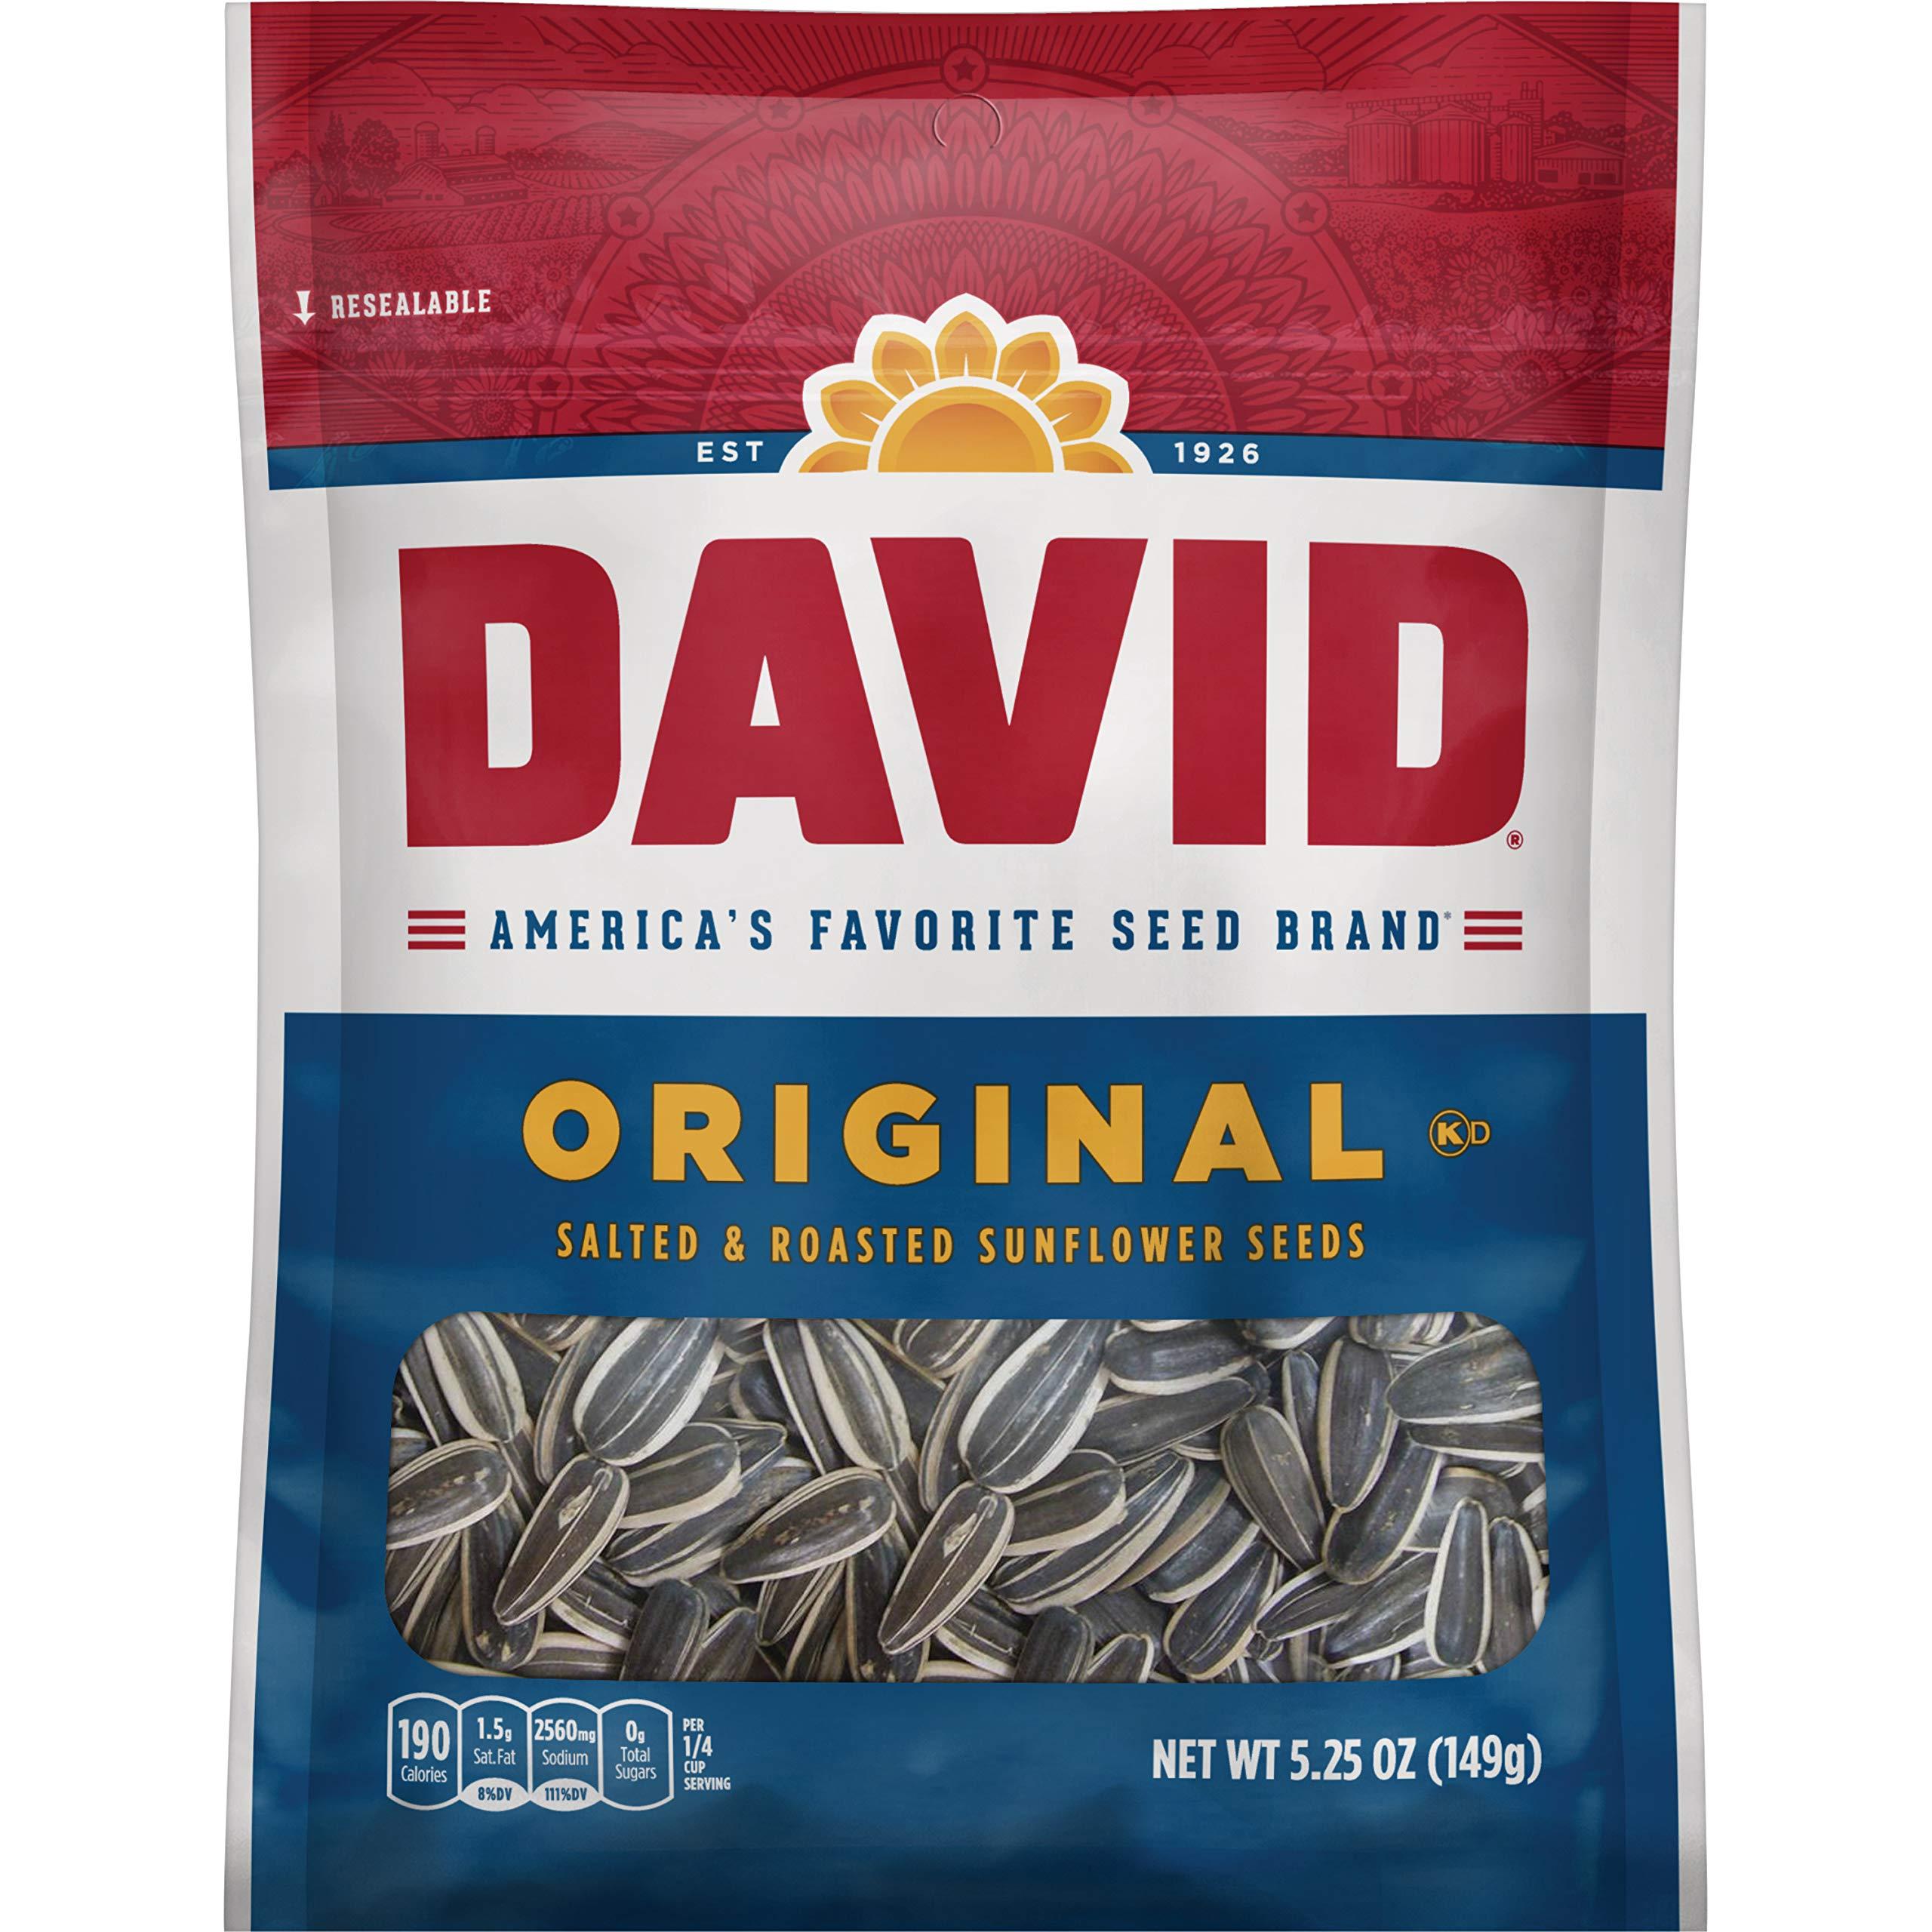 DAVID Roasted and Salted Original Sunflower Seeds, 5.25 oz